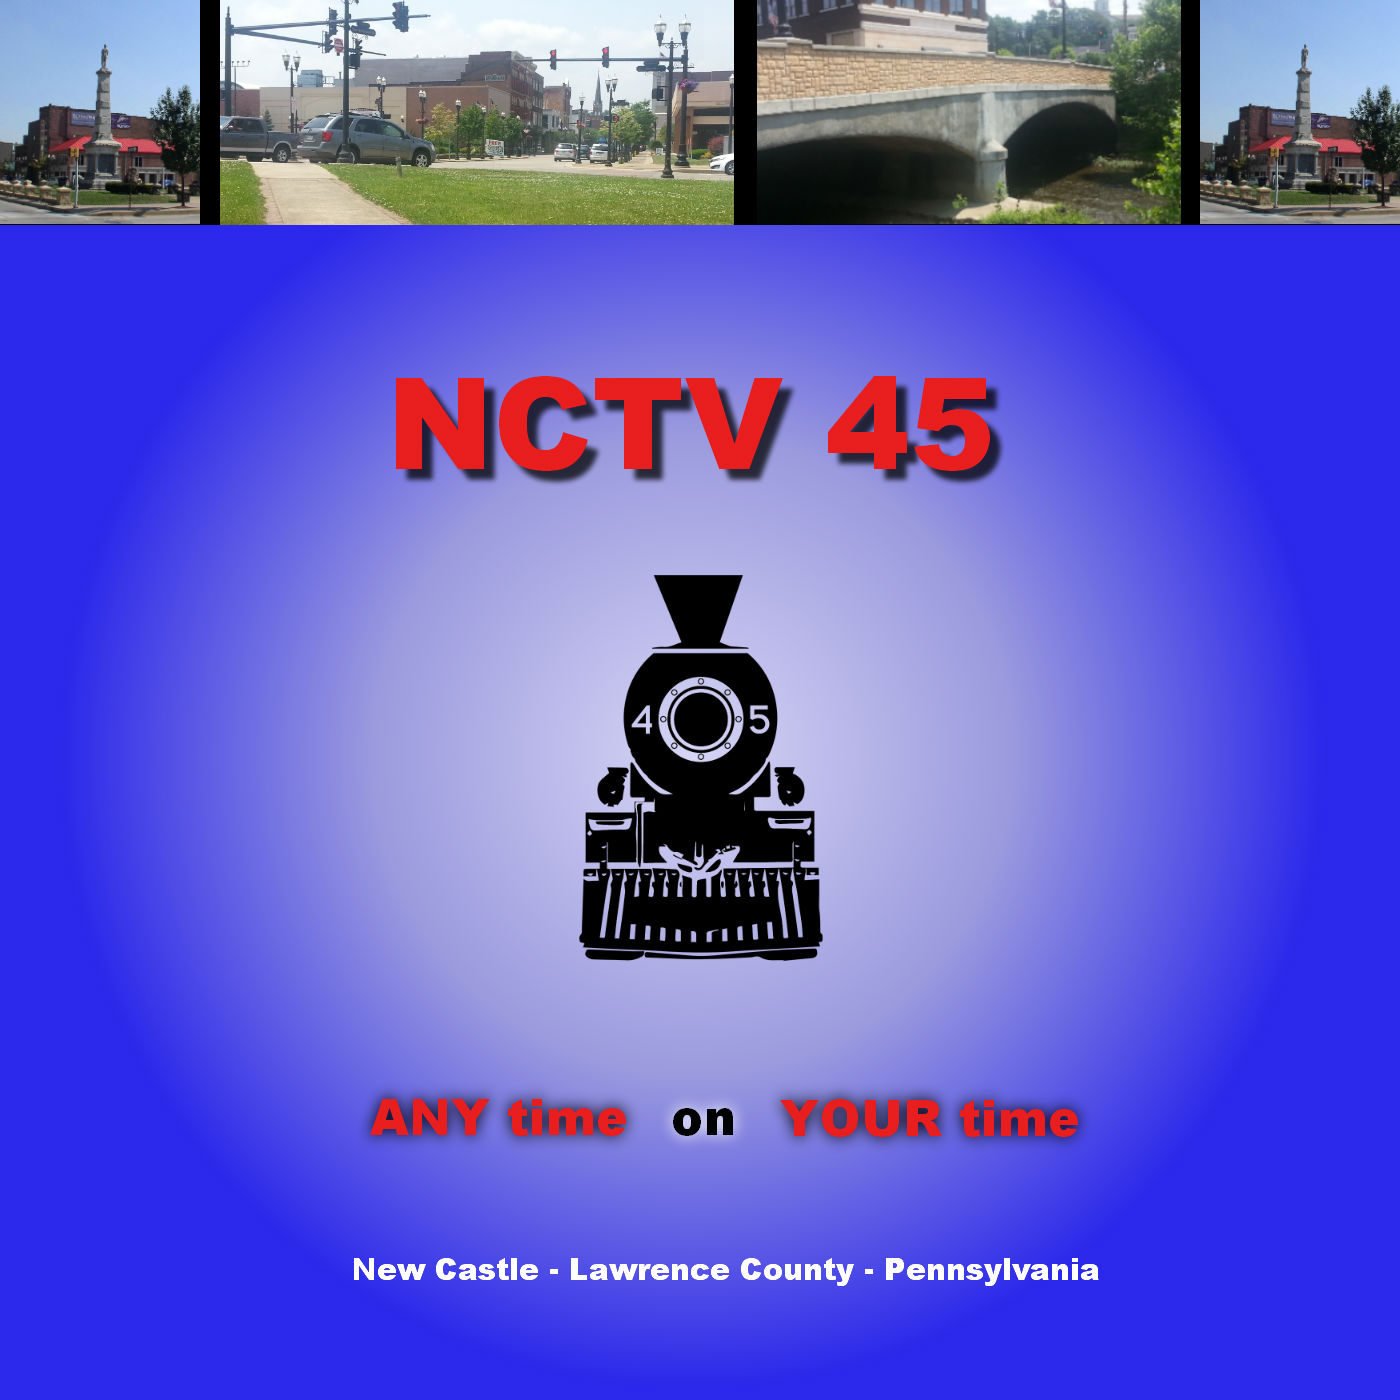 Artwork for NCTV45's NewsWatch NewsBrief Light up The Sky